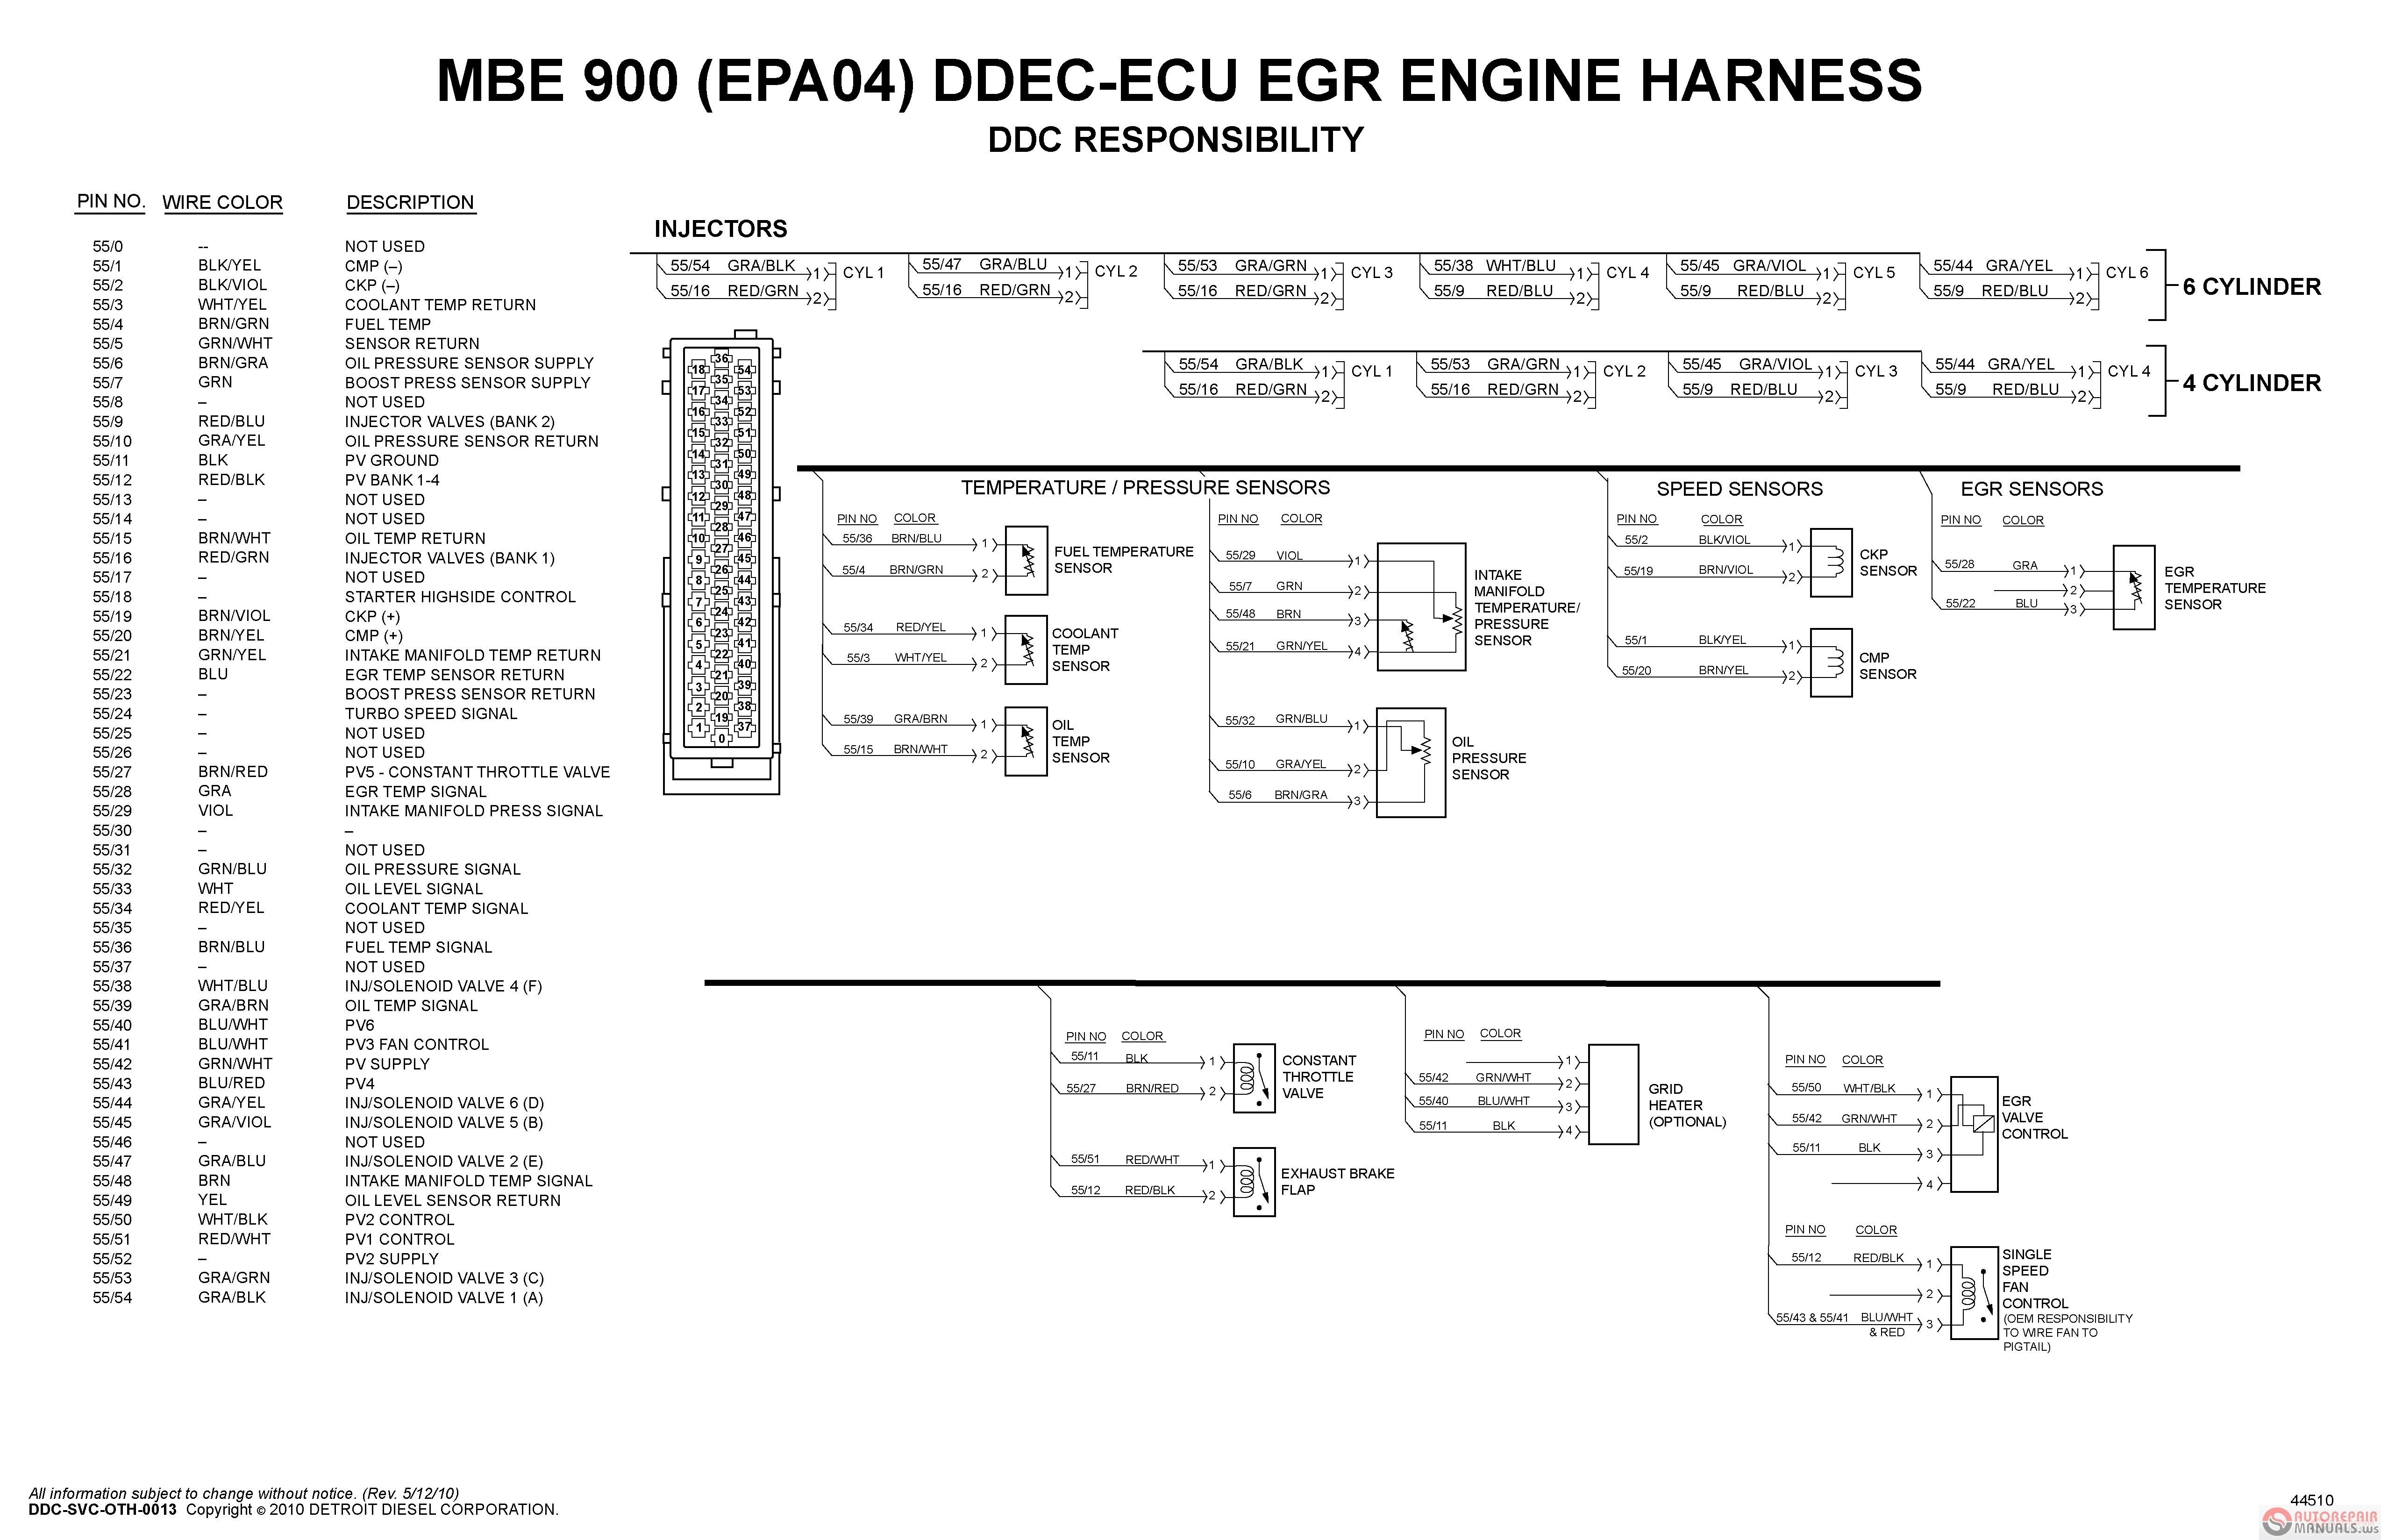 Detroit Diesel Ecm Wiring Diagram | Manual E-Books - Detroit Series 60 Ecm Wiring Diagram